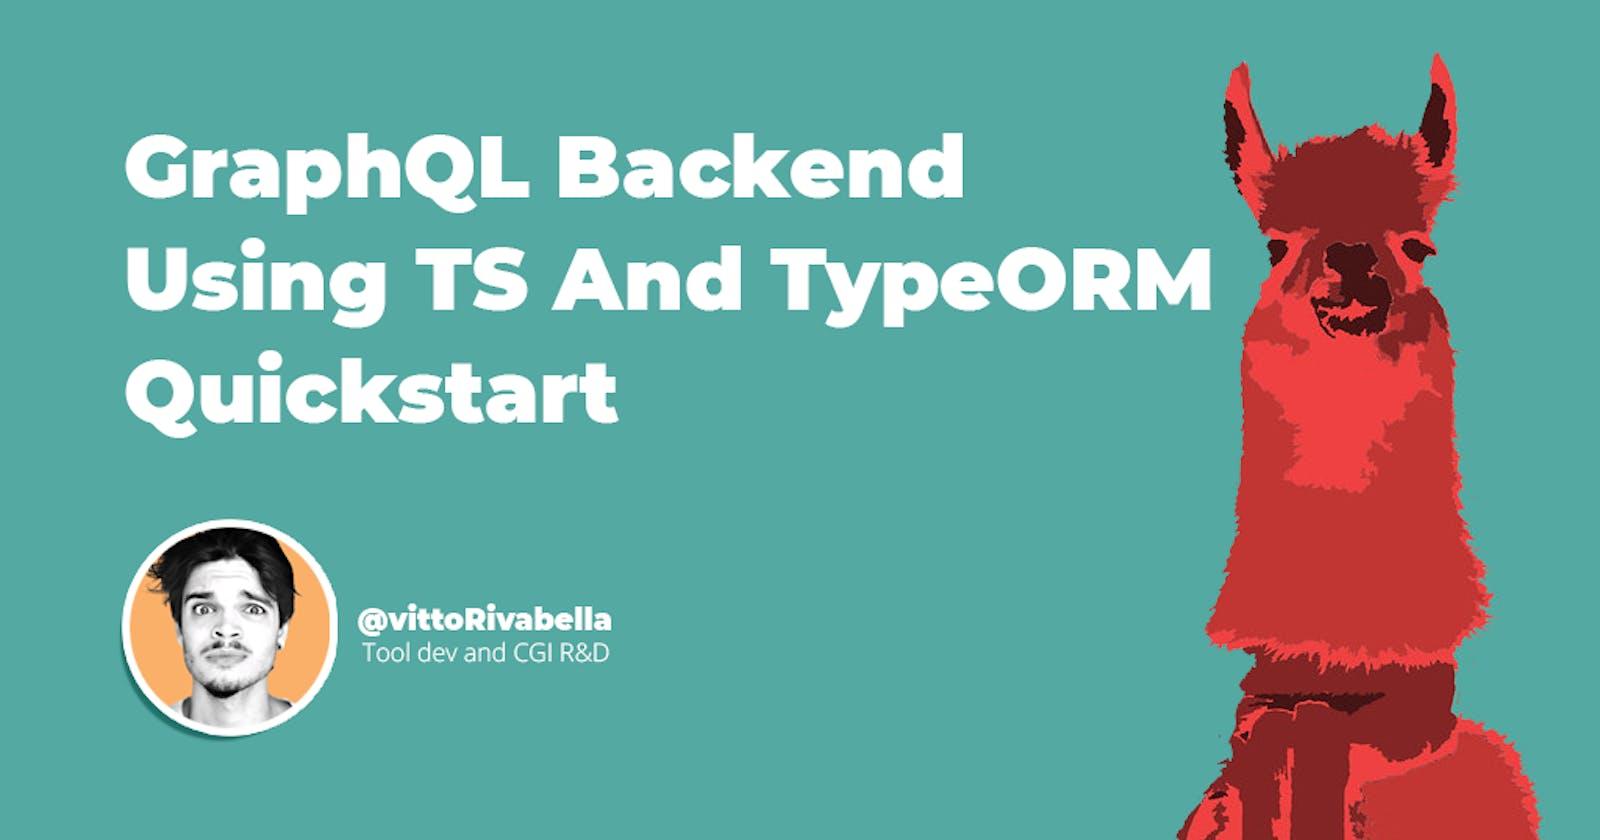 Set Up a GraphQL - TypeORM Backend in 4 Minutes | Quickstart